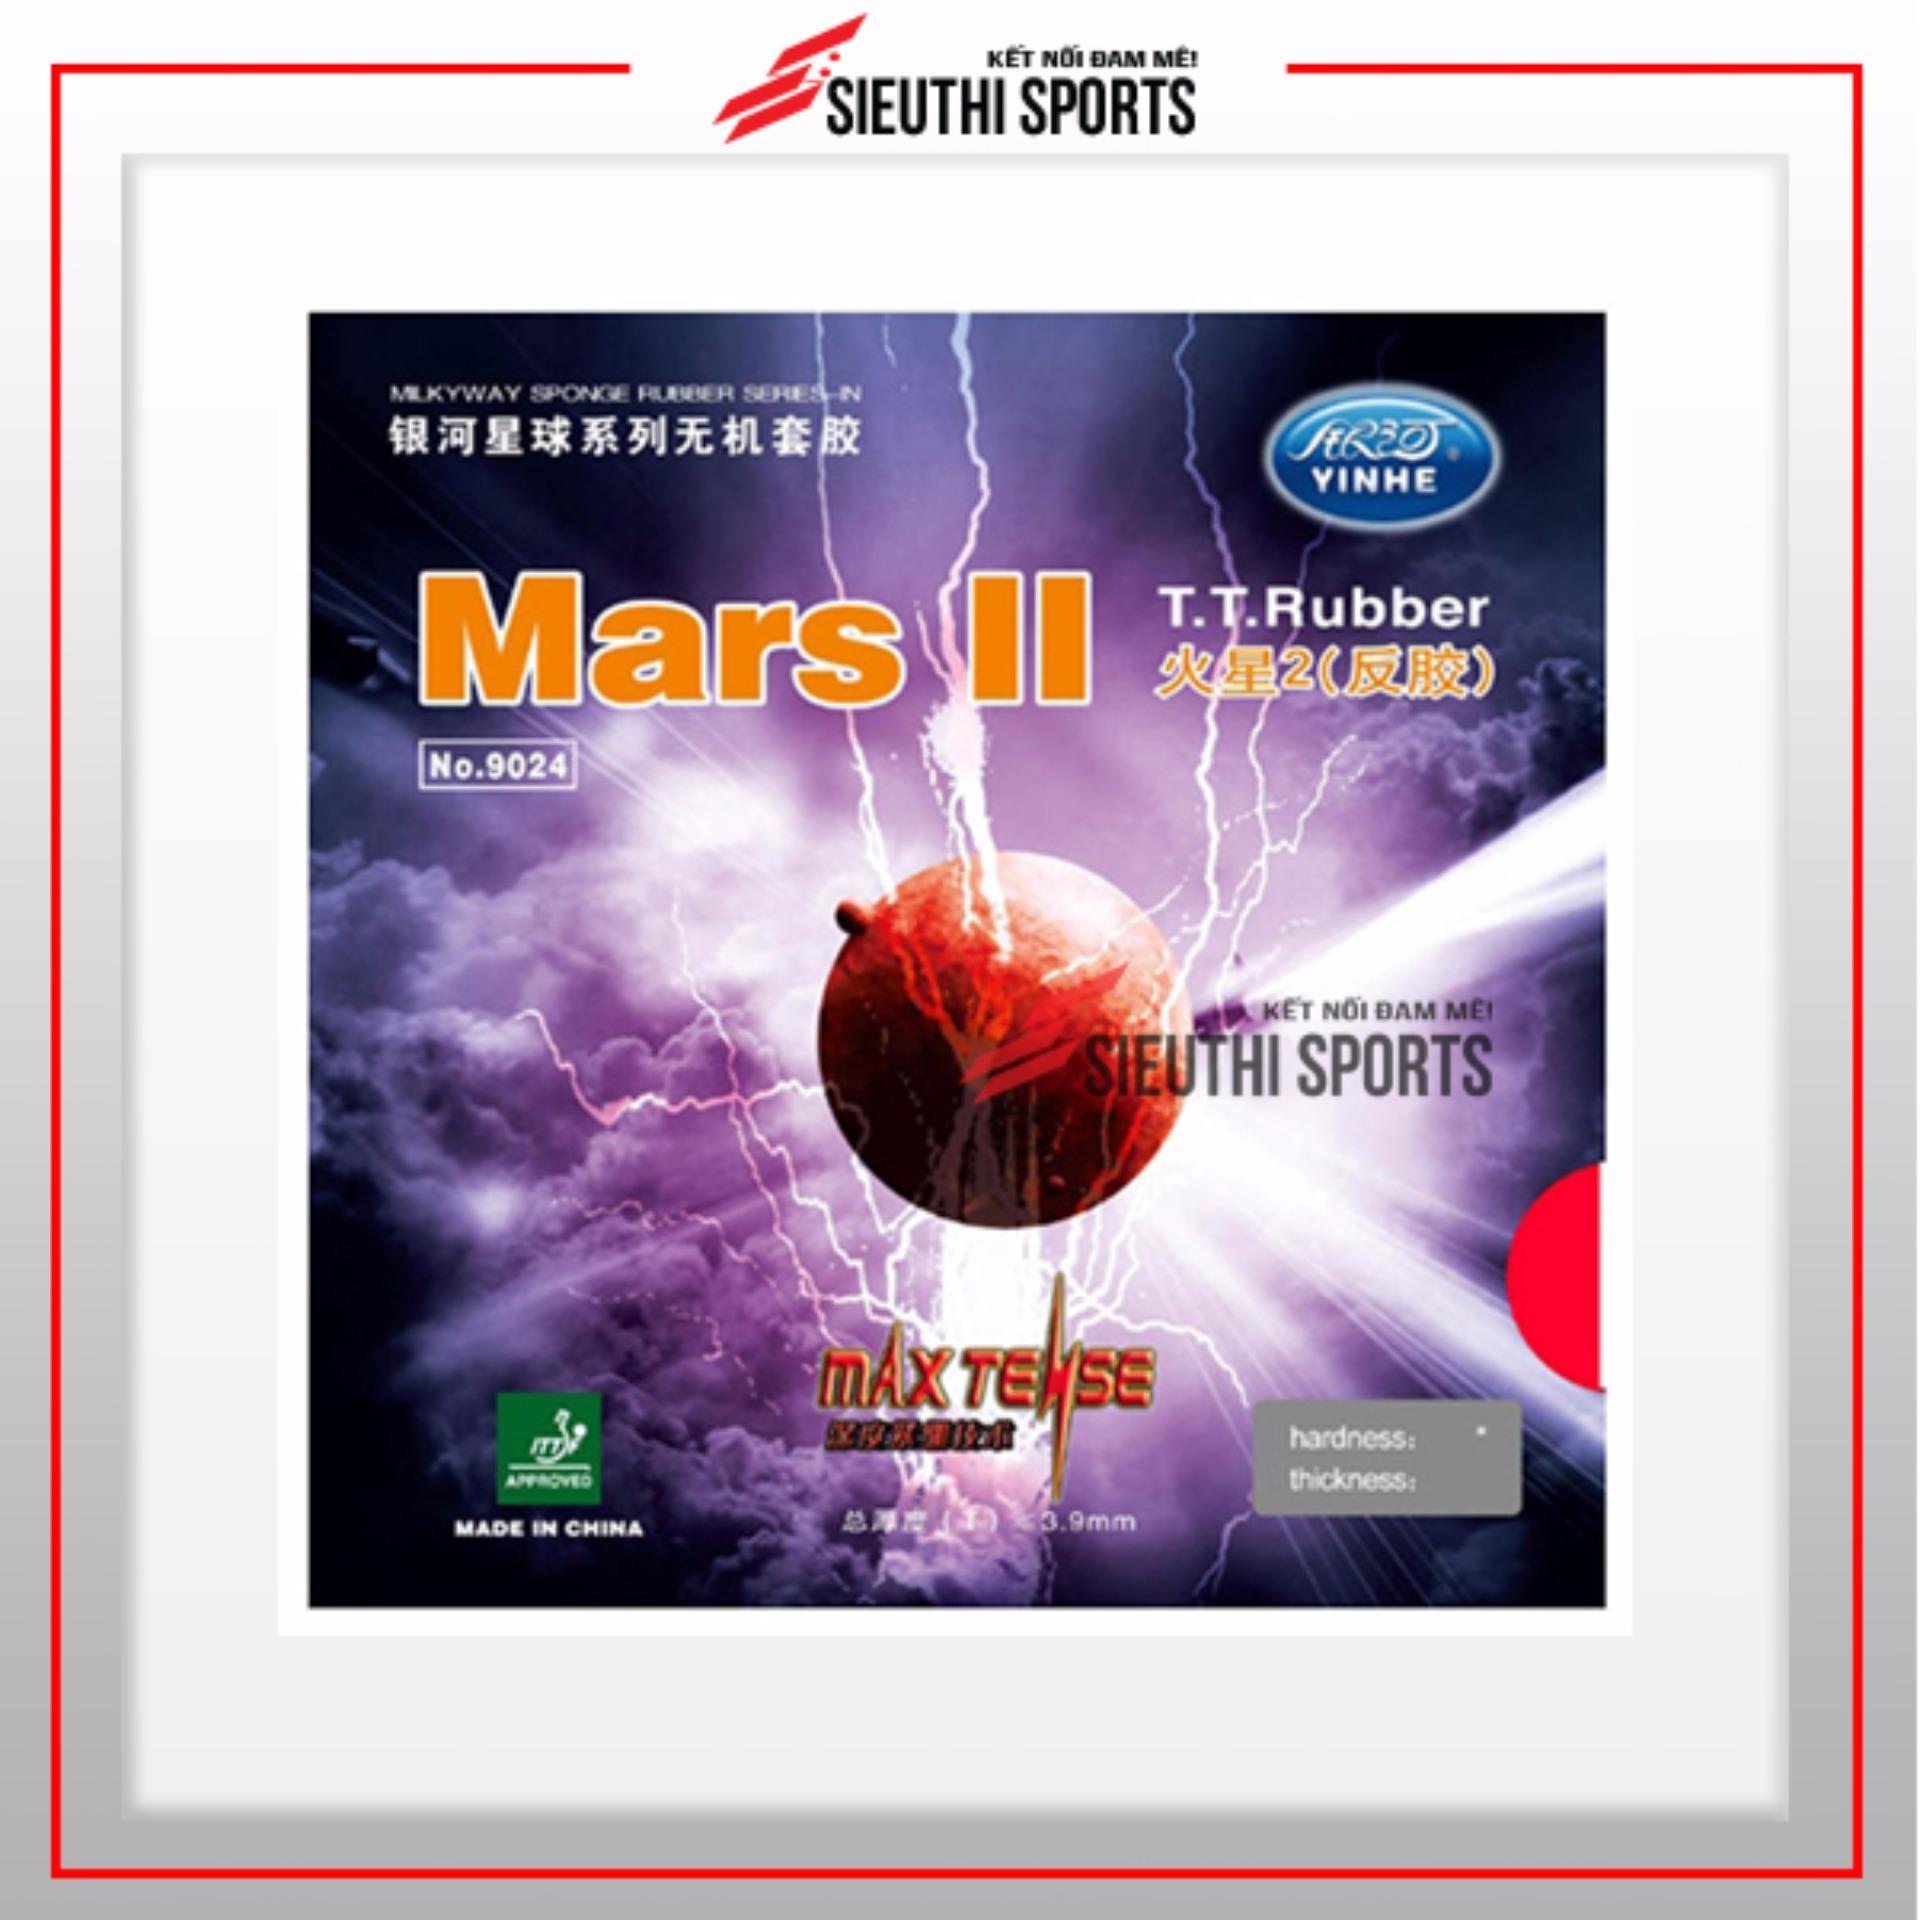 Mặt Vợt Mars II YinHe